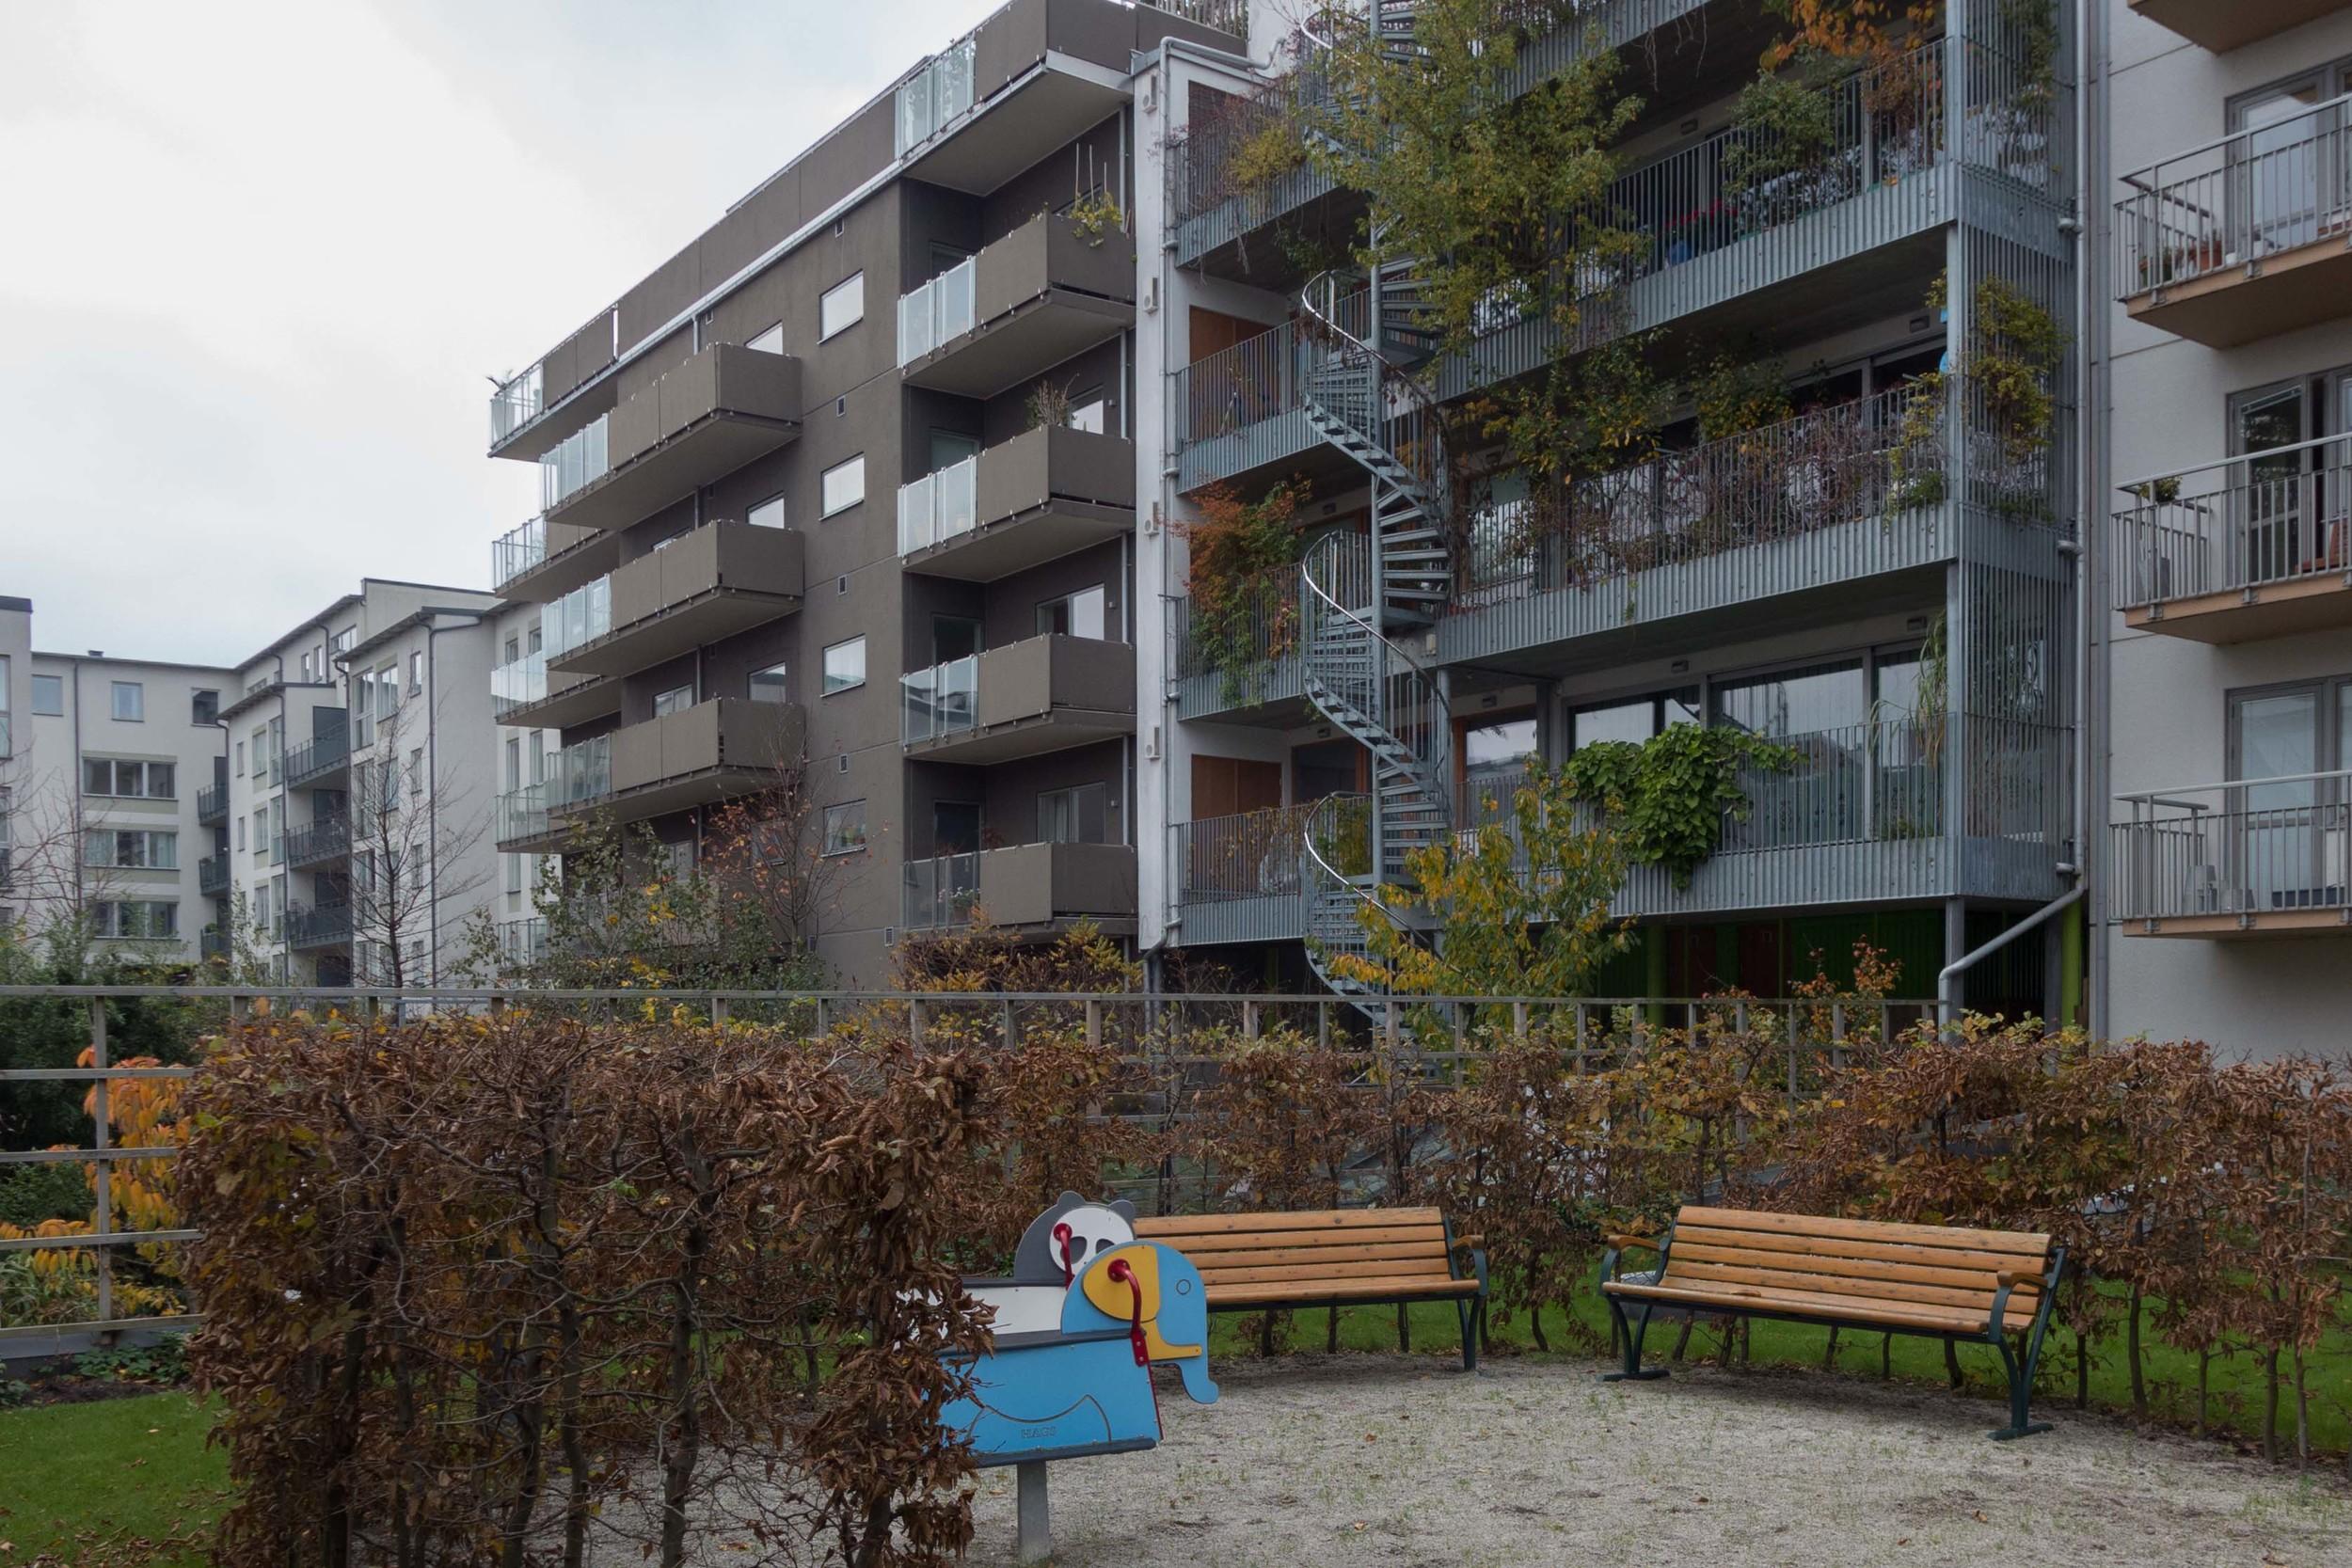 Malmo courtyard 1.jpg